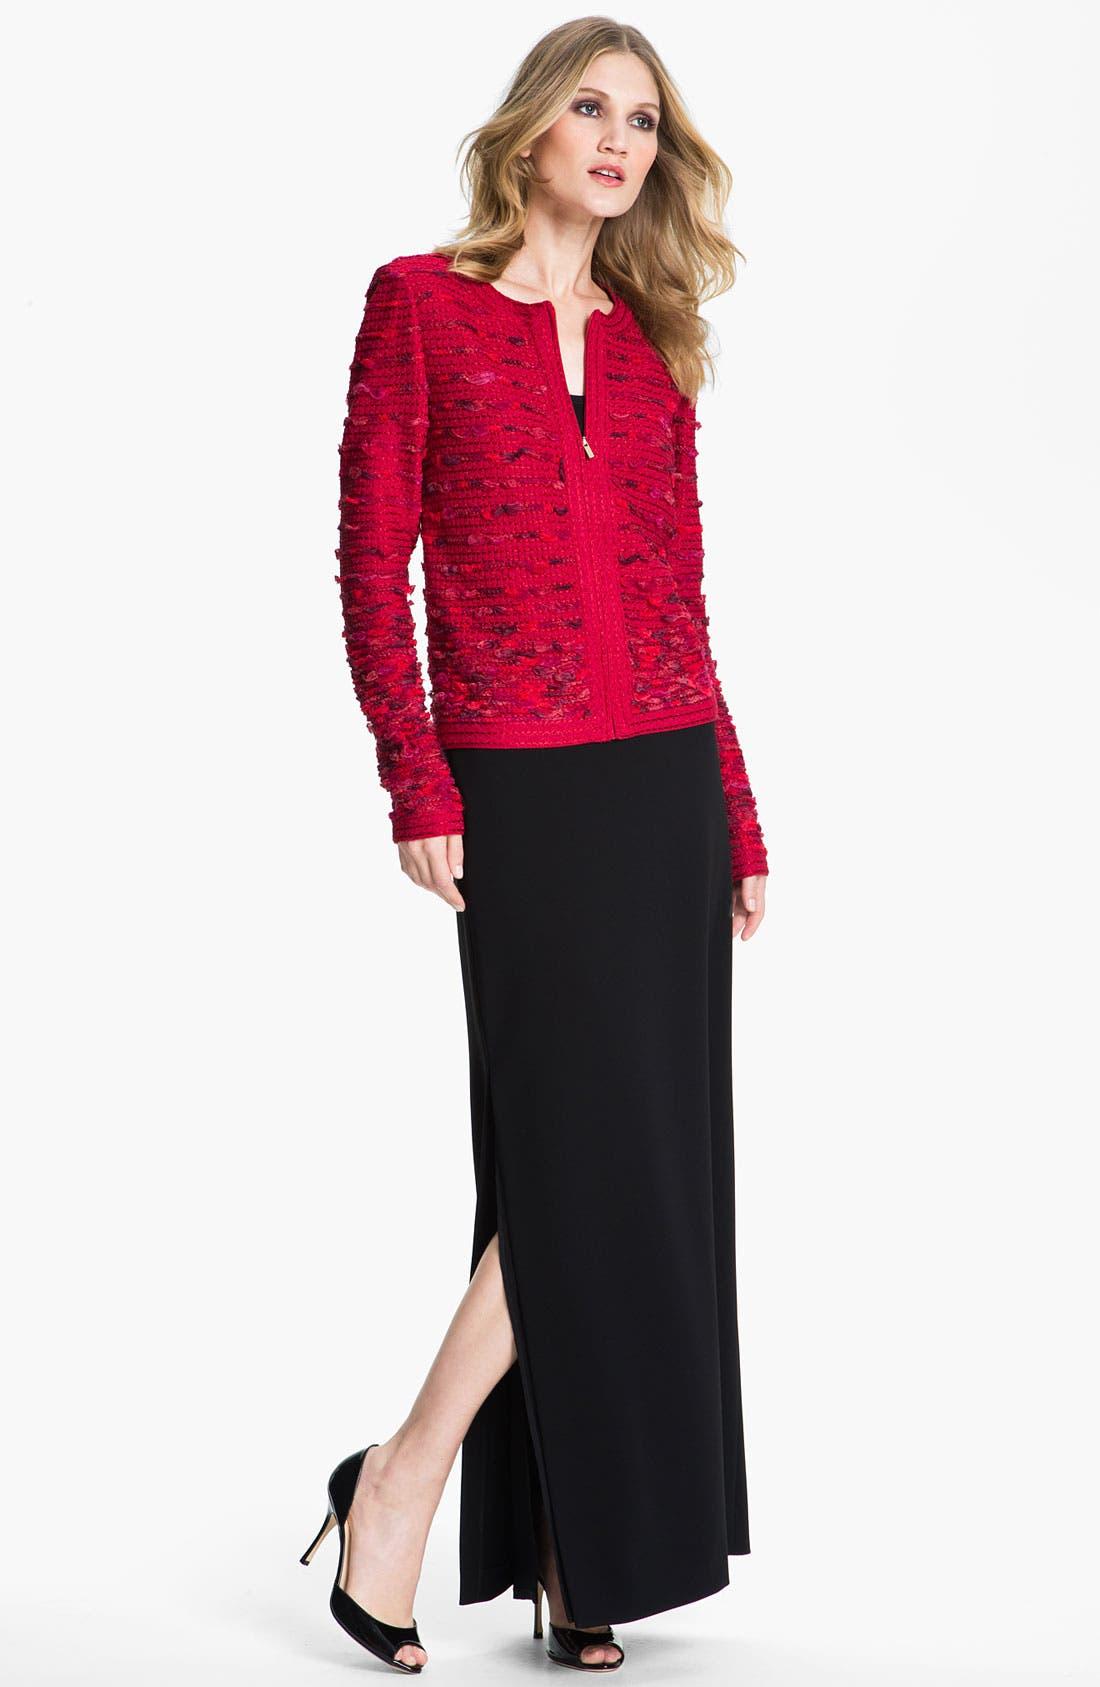 Alternate Image 1 Selected - St. John Collection Crepe Marocain Gown Skirt